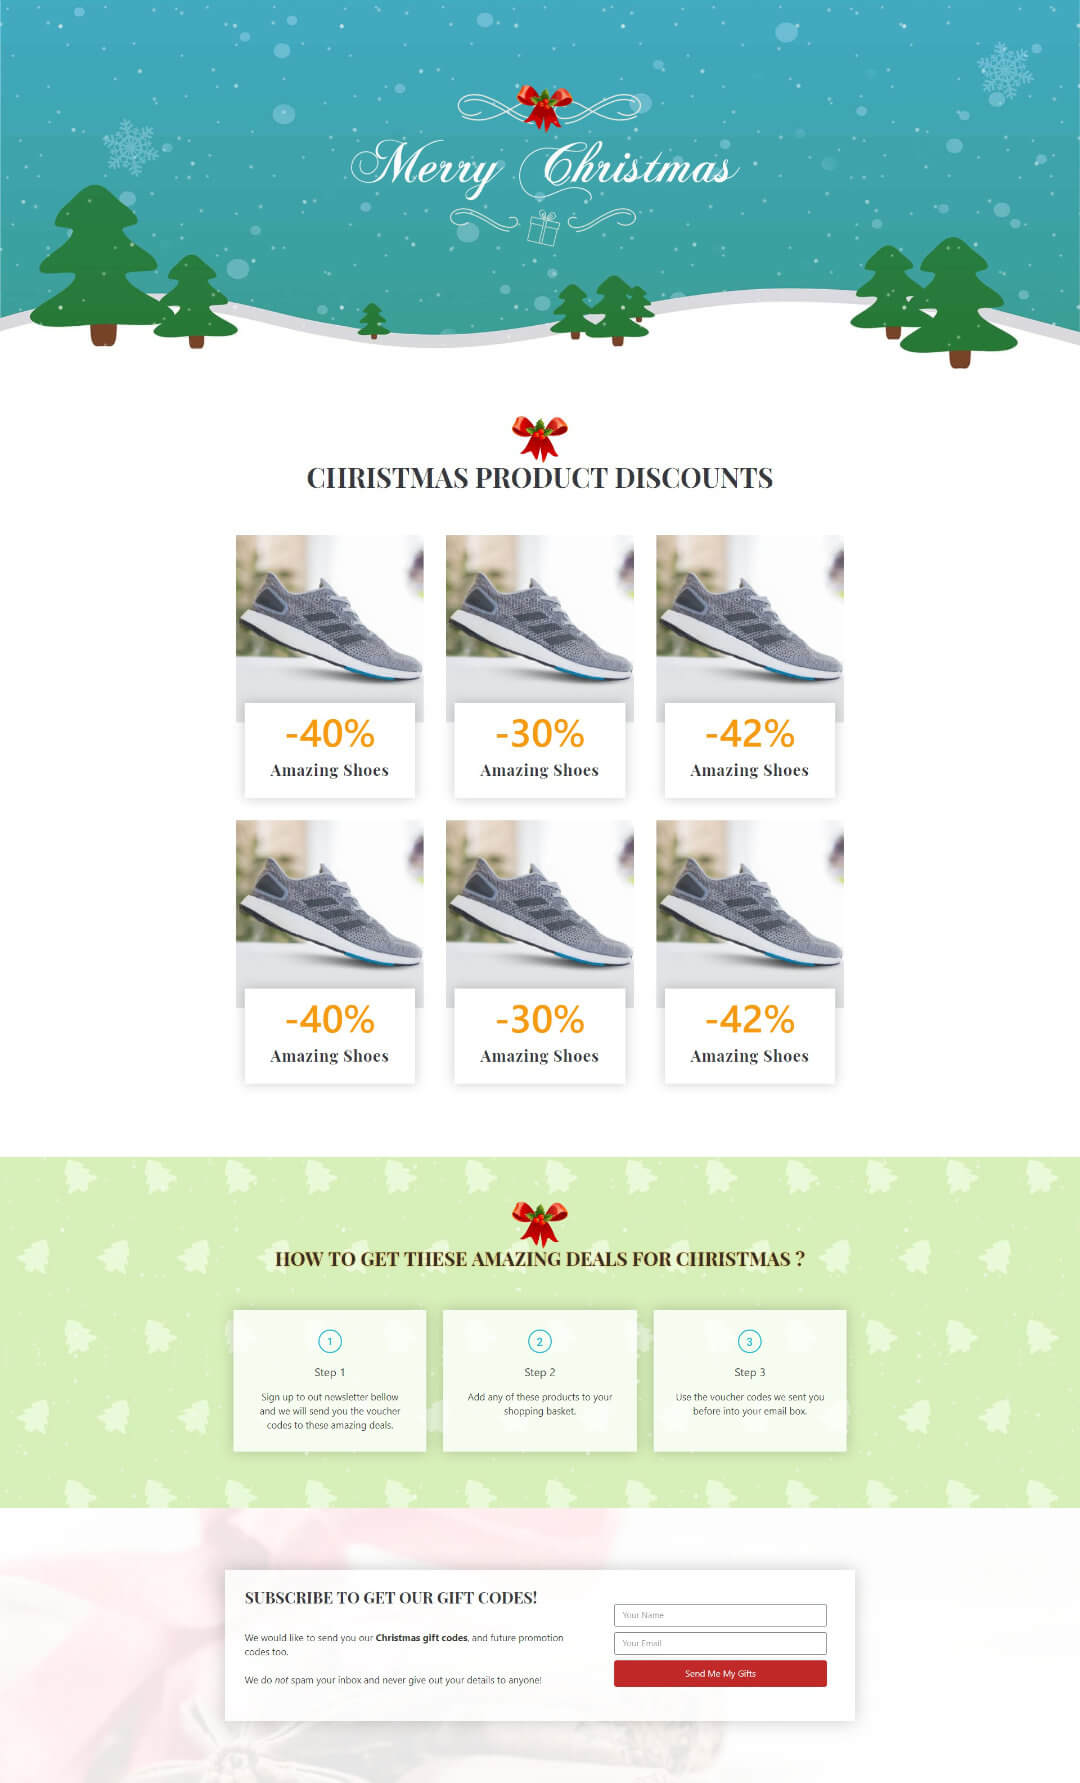 Katka-Elementor-Christmas-promo-landing-page-with-snow-effect-1.jpg